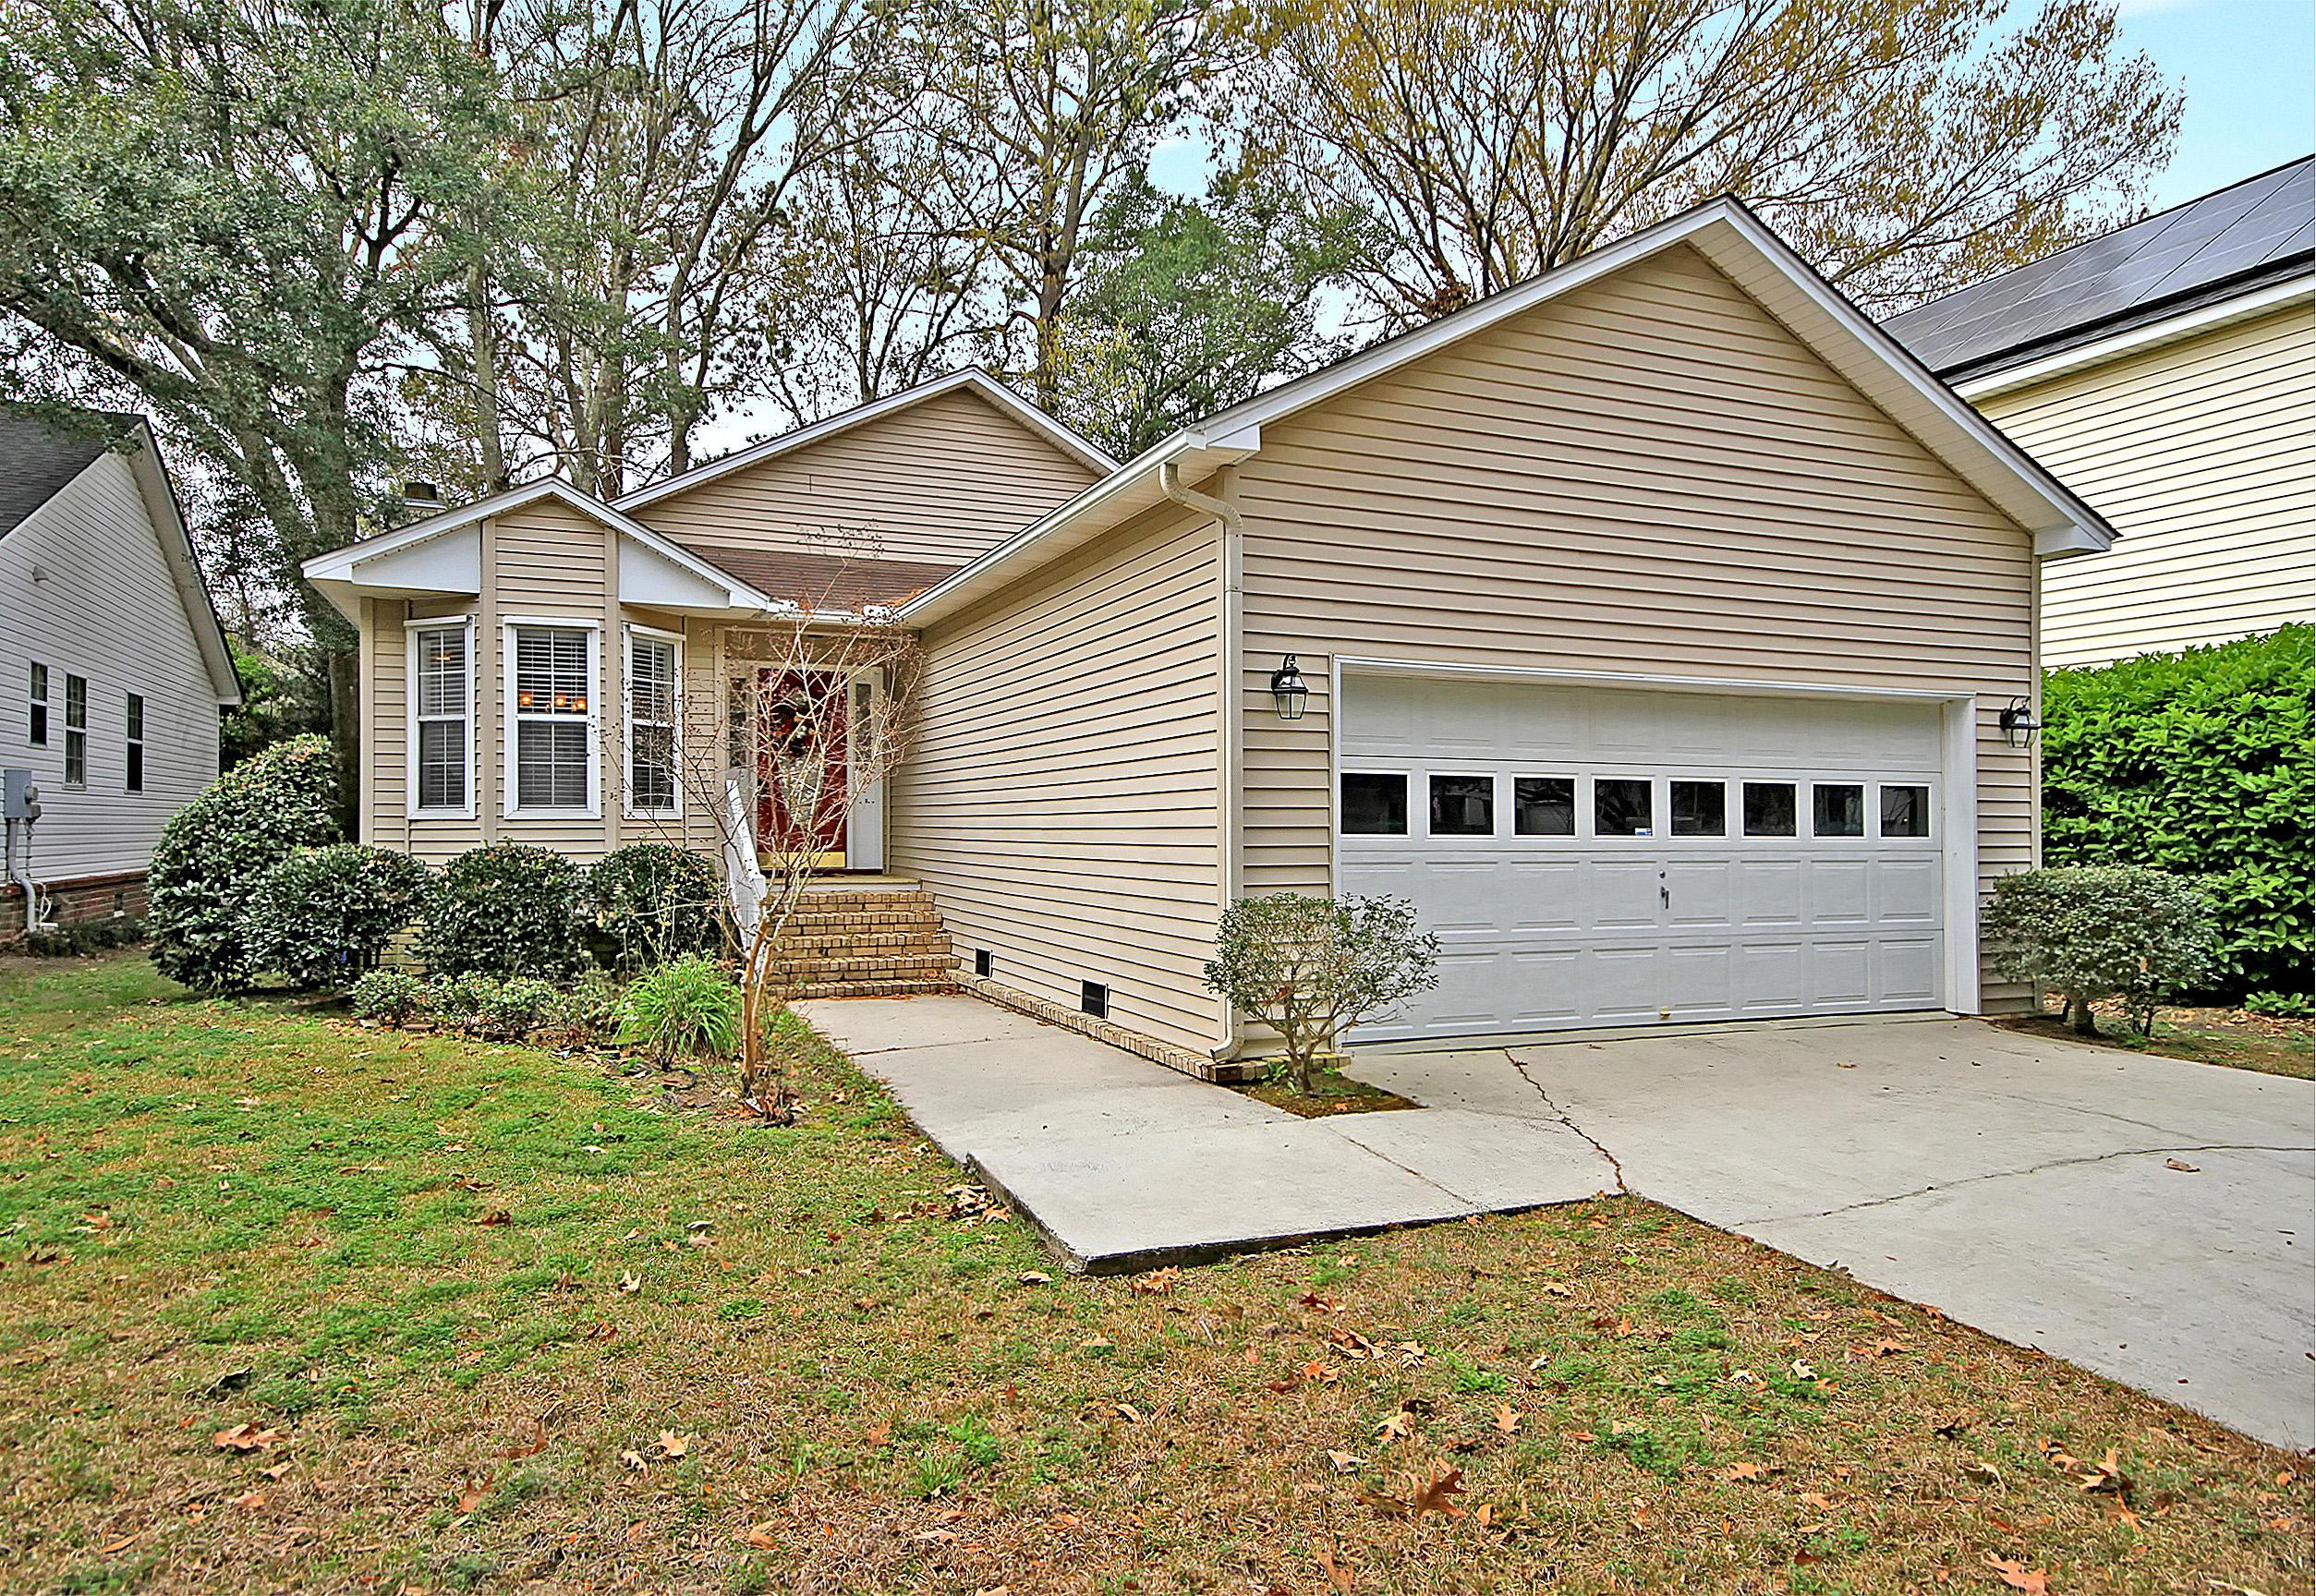 Harbor Place Homes For Sale - 845 Harbor Pl, Charleston, SC - 22